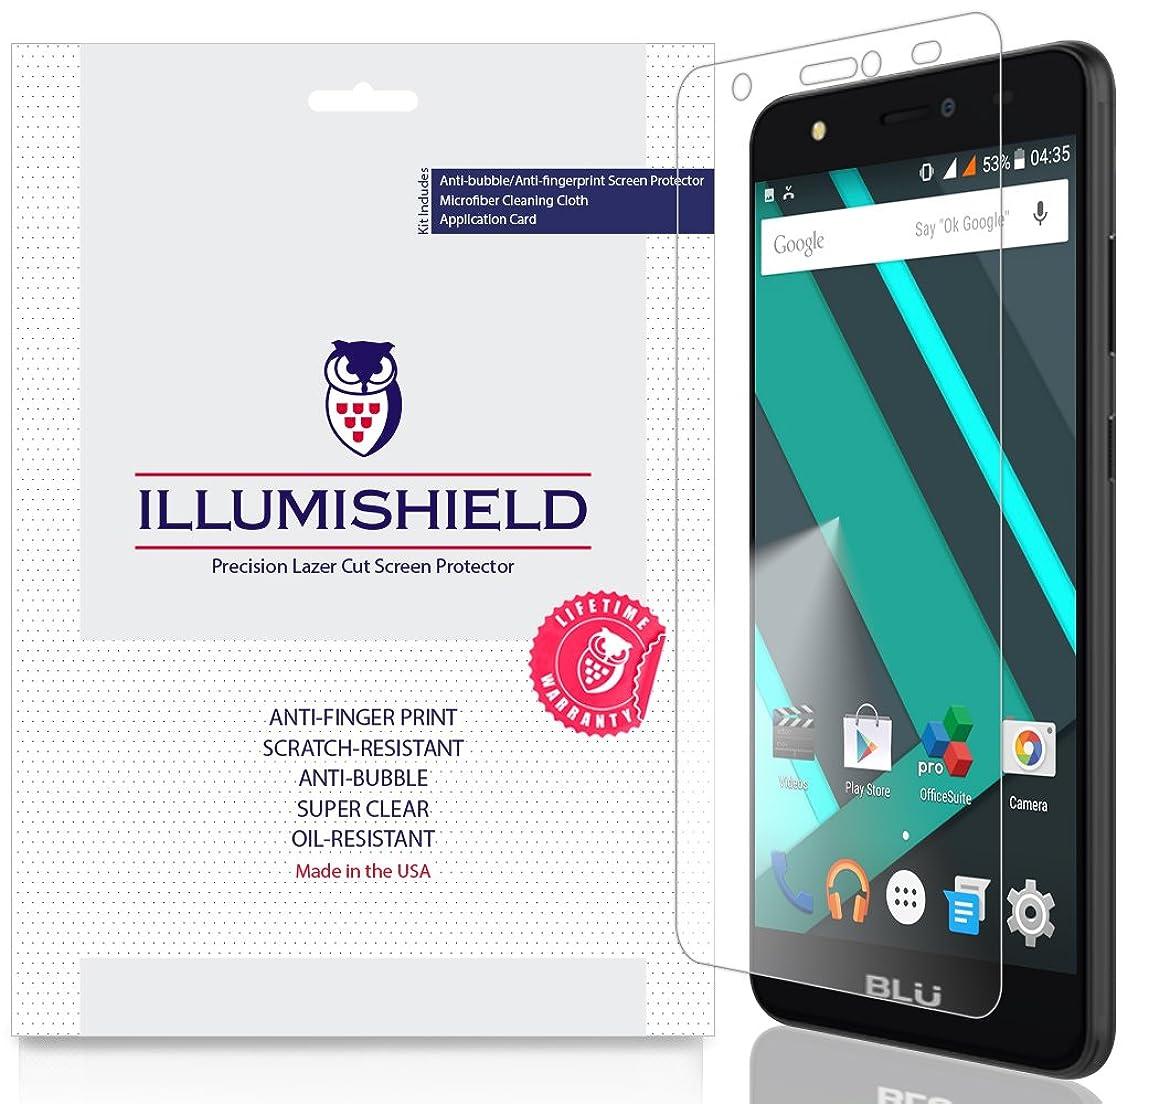 BLU Studio J8 Screen Protector (LTE Compatible)[3-Pack], iLLumiShield Screen Protector for BLU Studio J8 Clear HD Shield with Anti-Bubble & Anti-Fingerprint Film